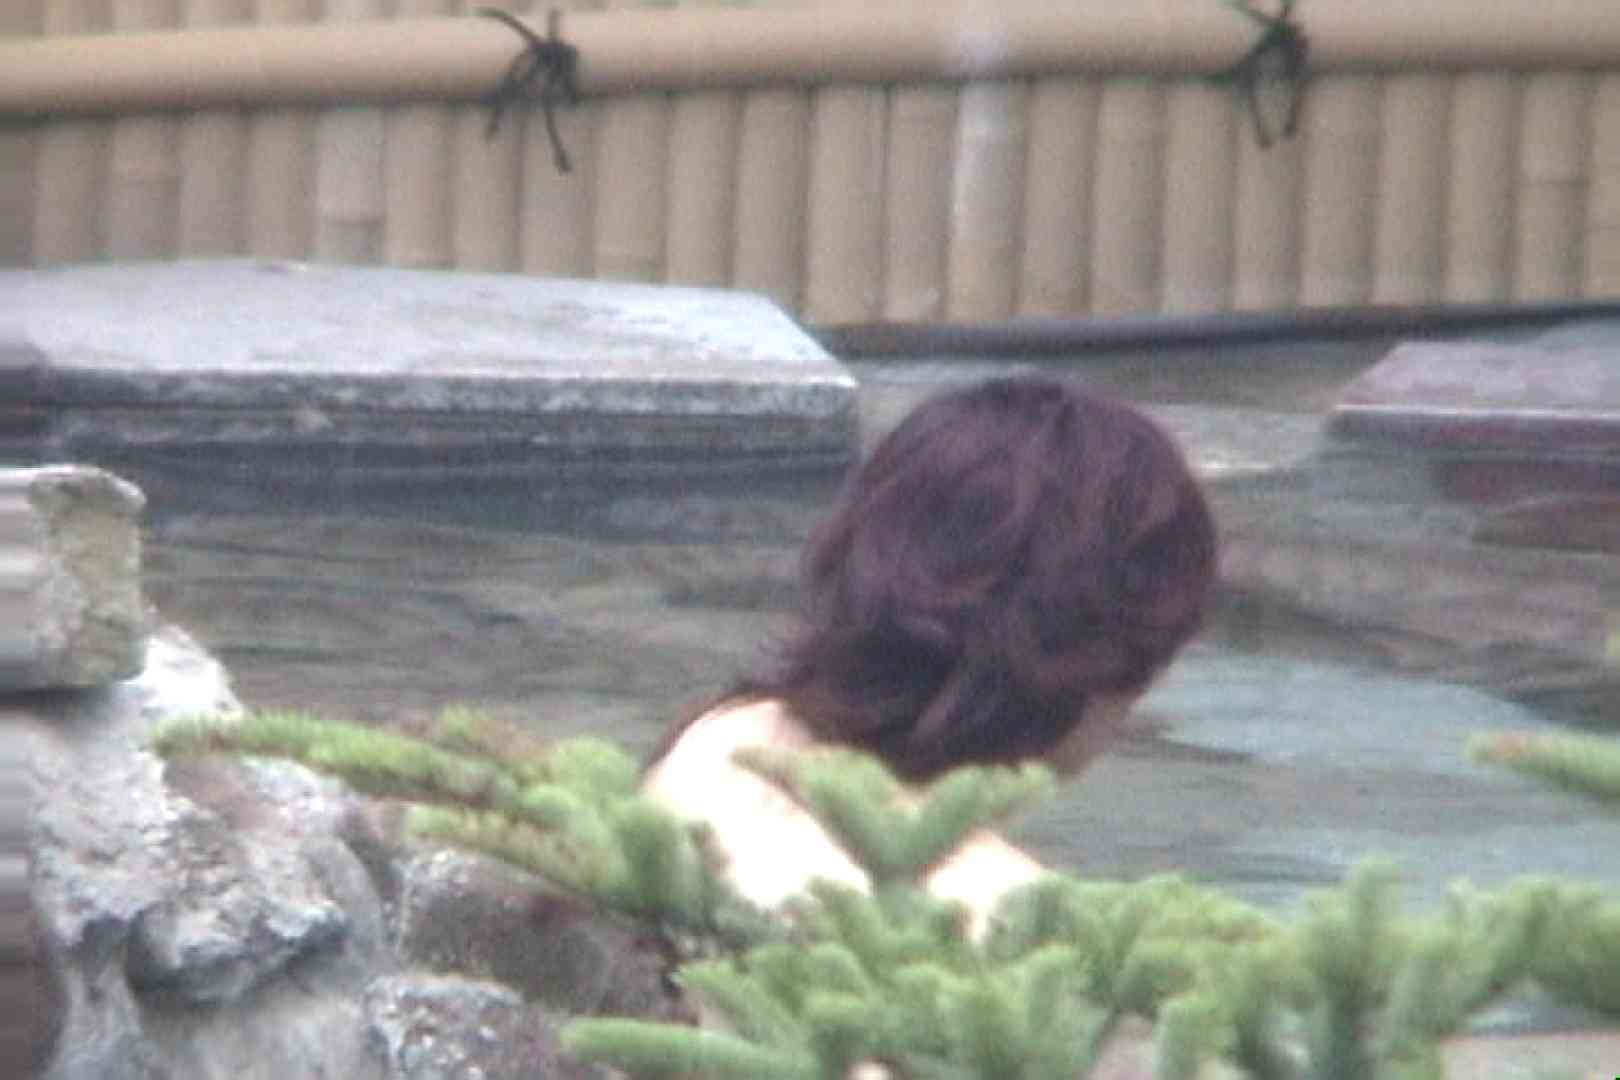 Aquaな露天風呂Vol.81【VIP限定】 OLのエロ生活 戯れ無修正画像 56連発 38